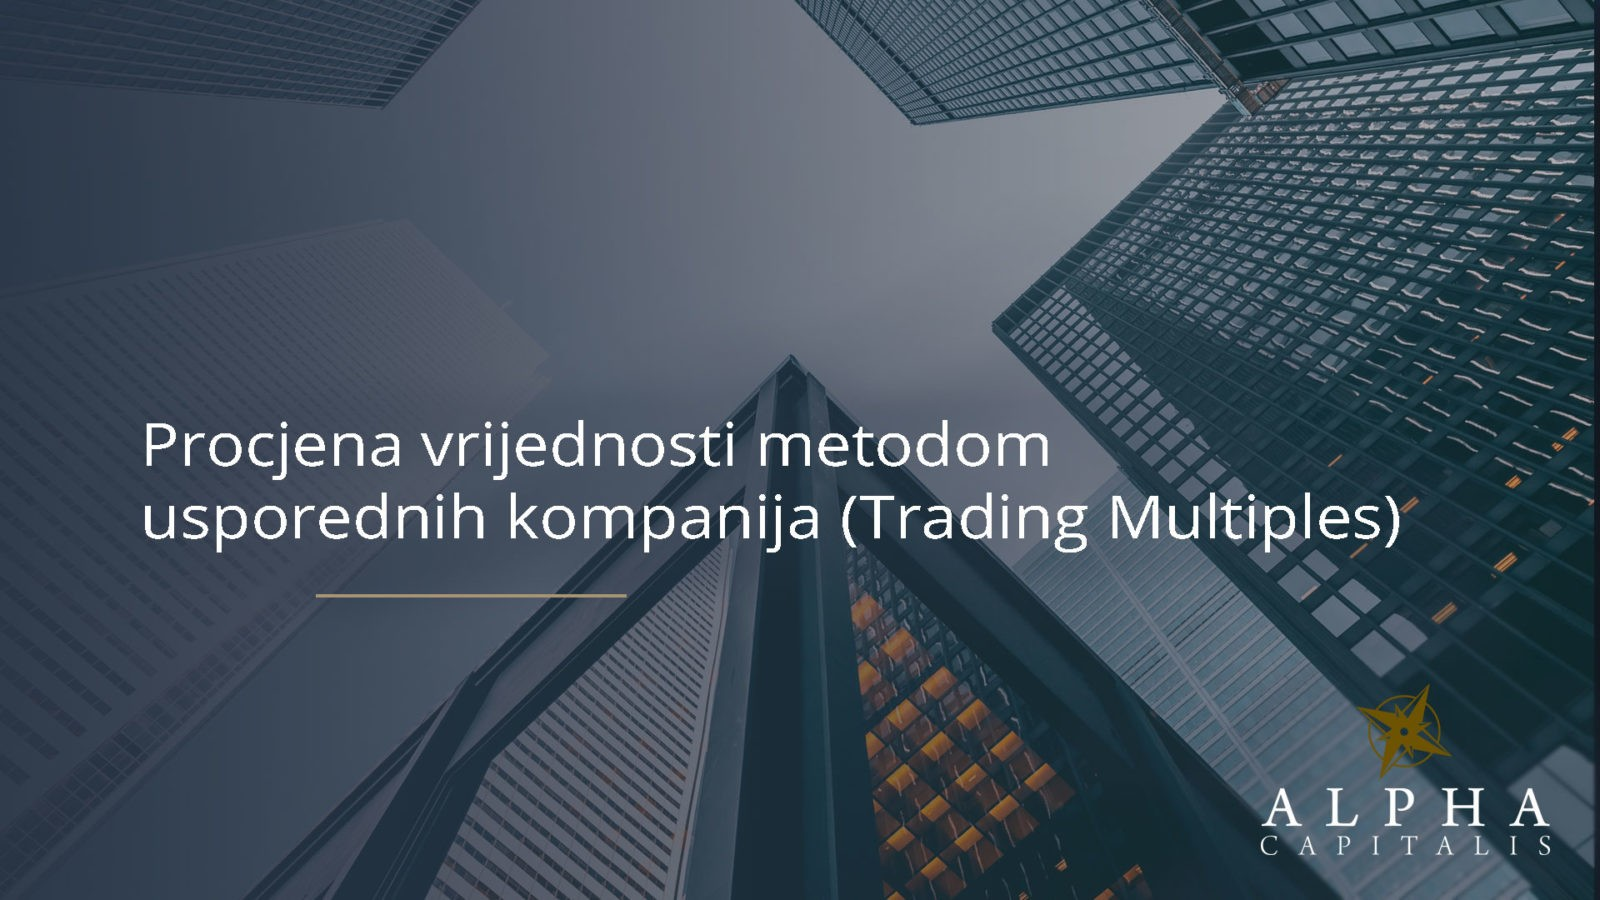 procjena vrijednosti - Procjena vrijednosti metodom usporednih kompanija (Trading Multiples)